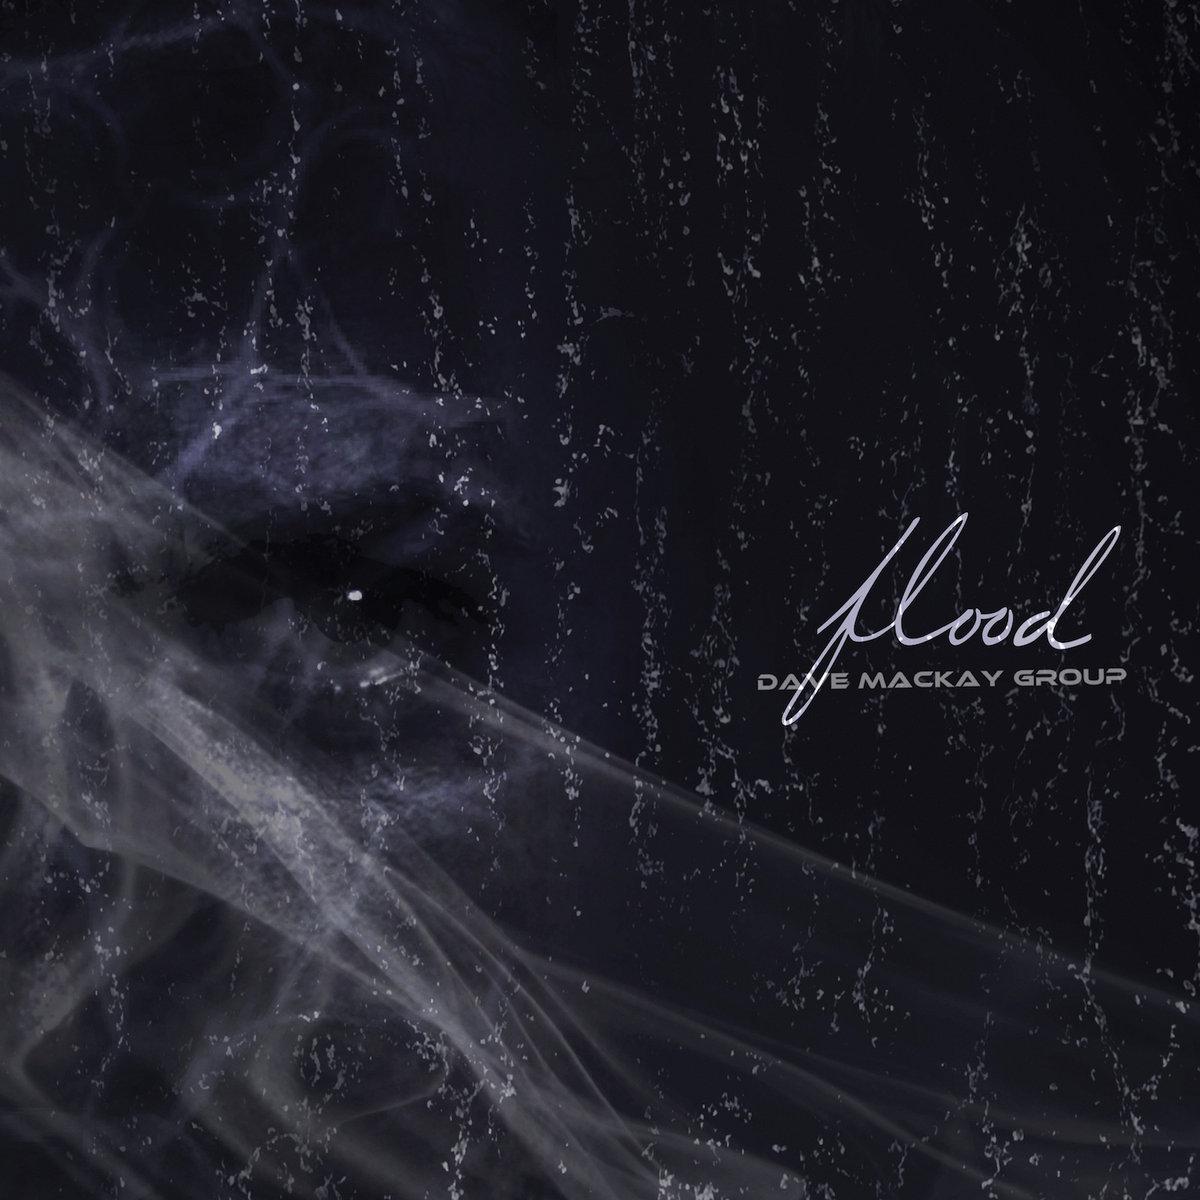 Dave Mackay - Flood